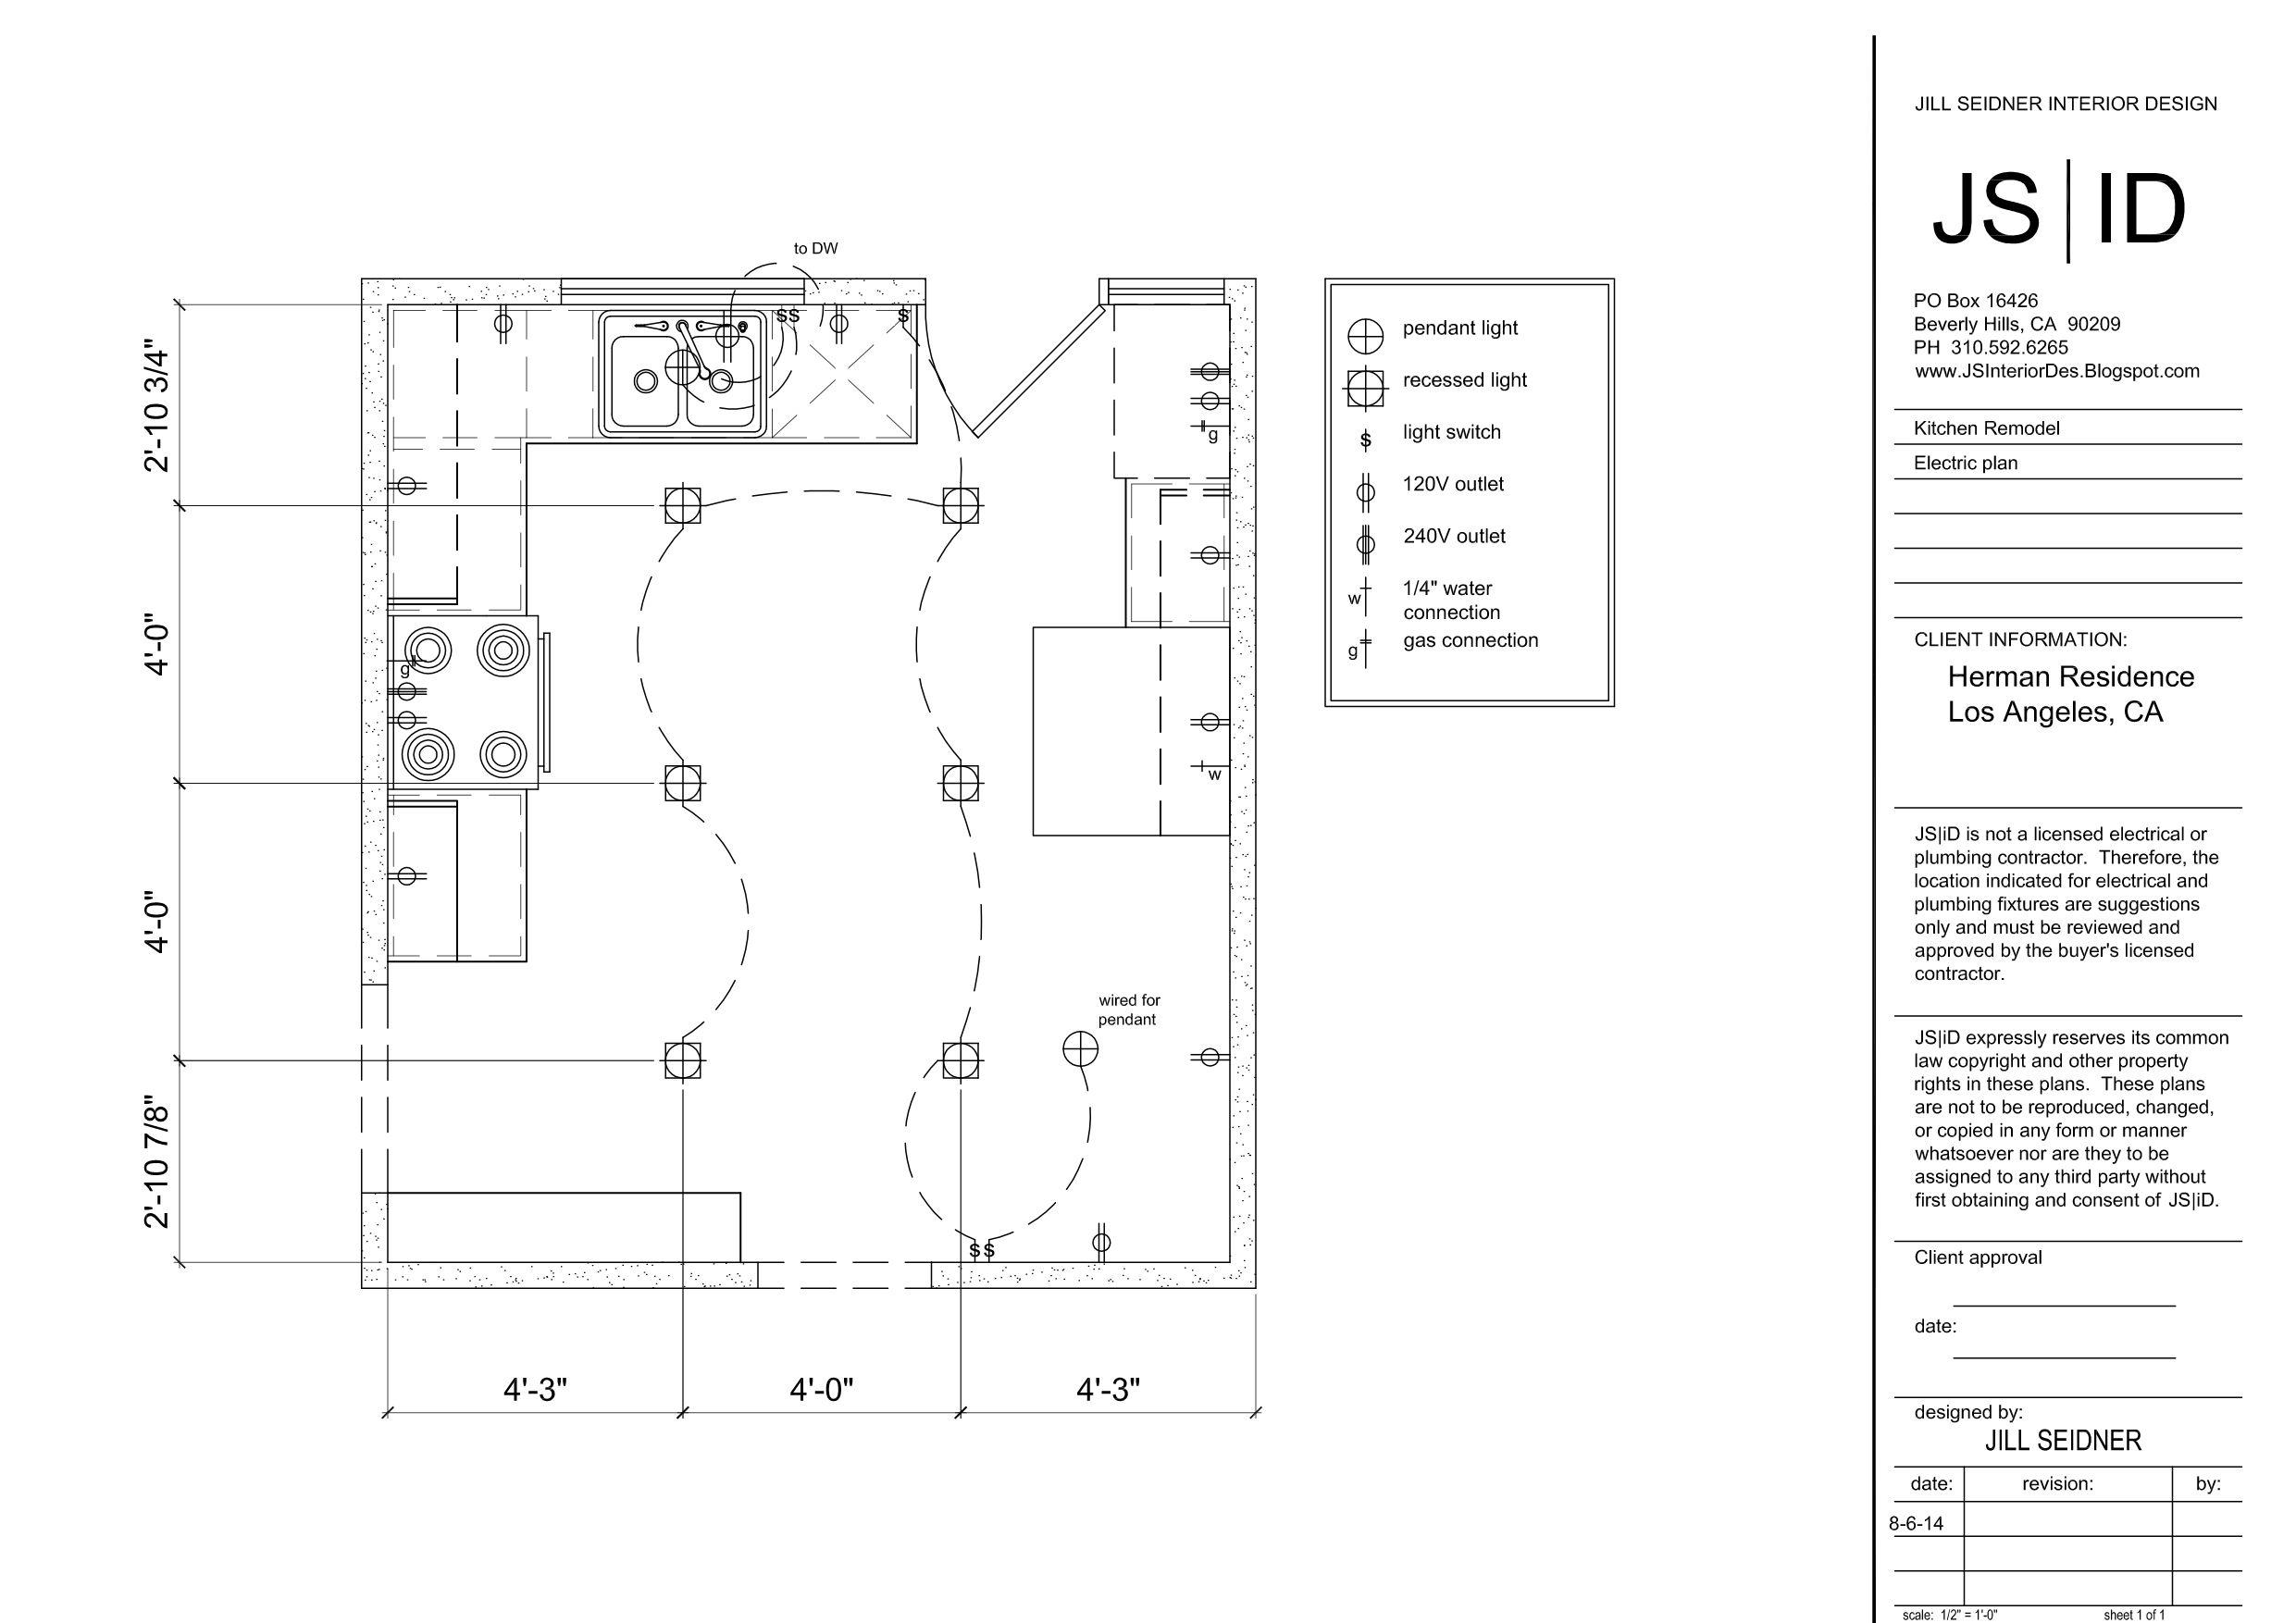 Los Angeles CA Duplex Kitchen Remodel Lighting & Electrical Plan